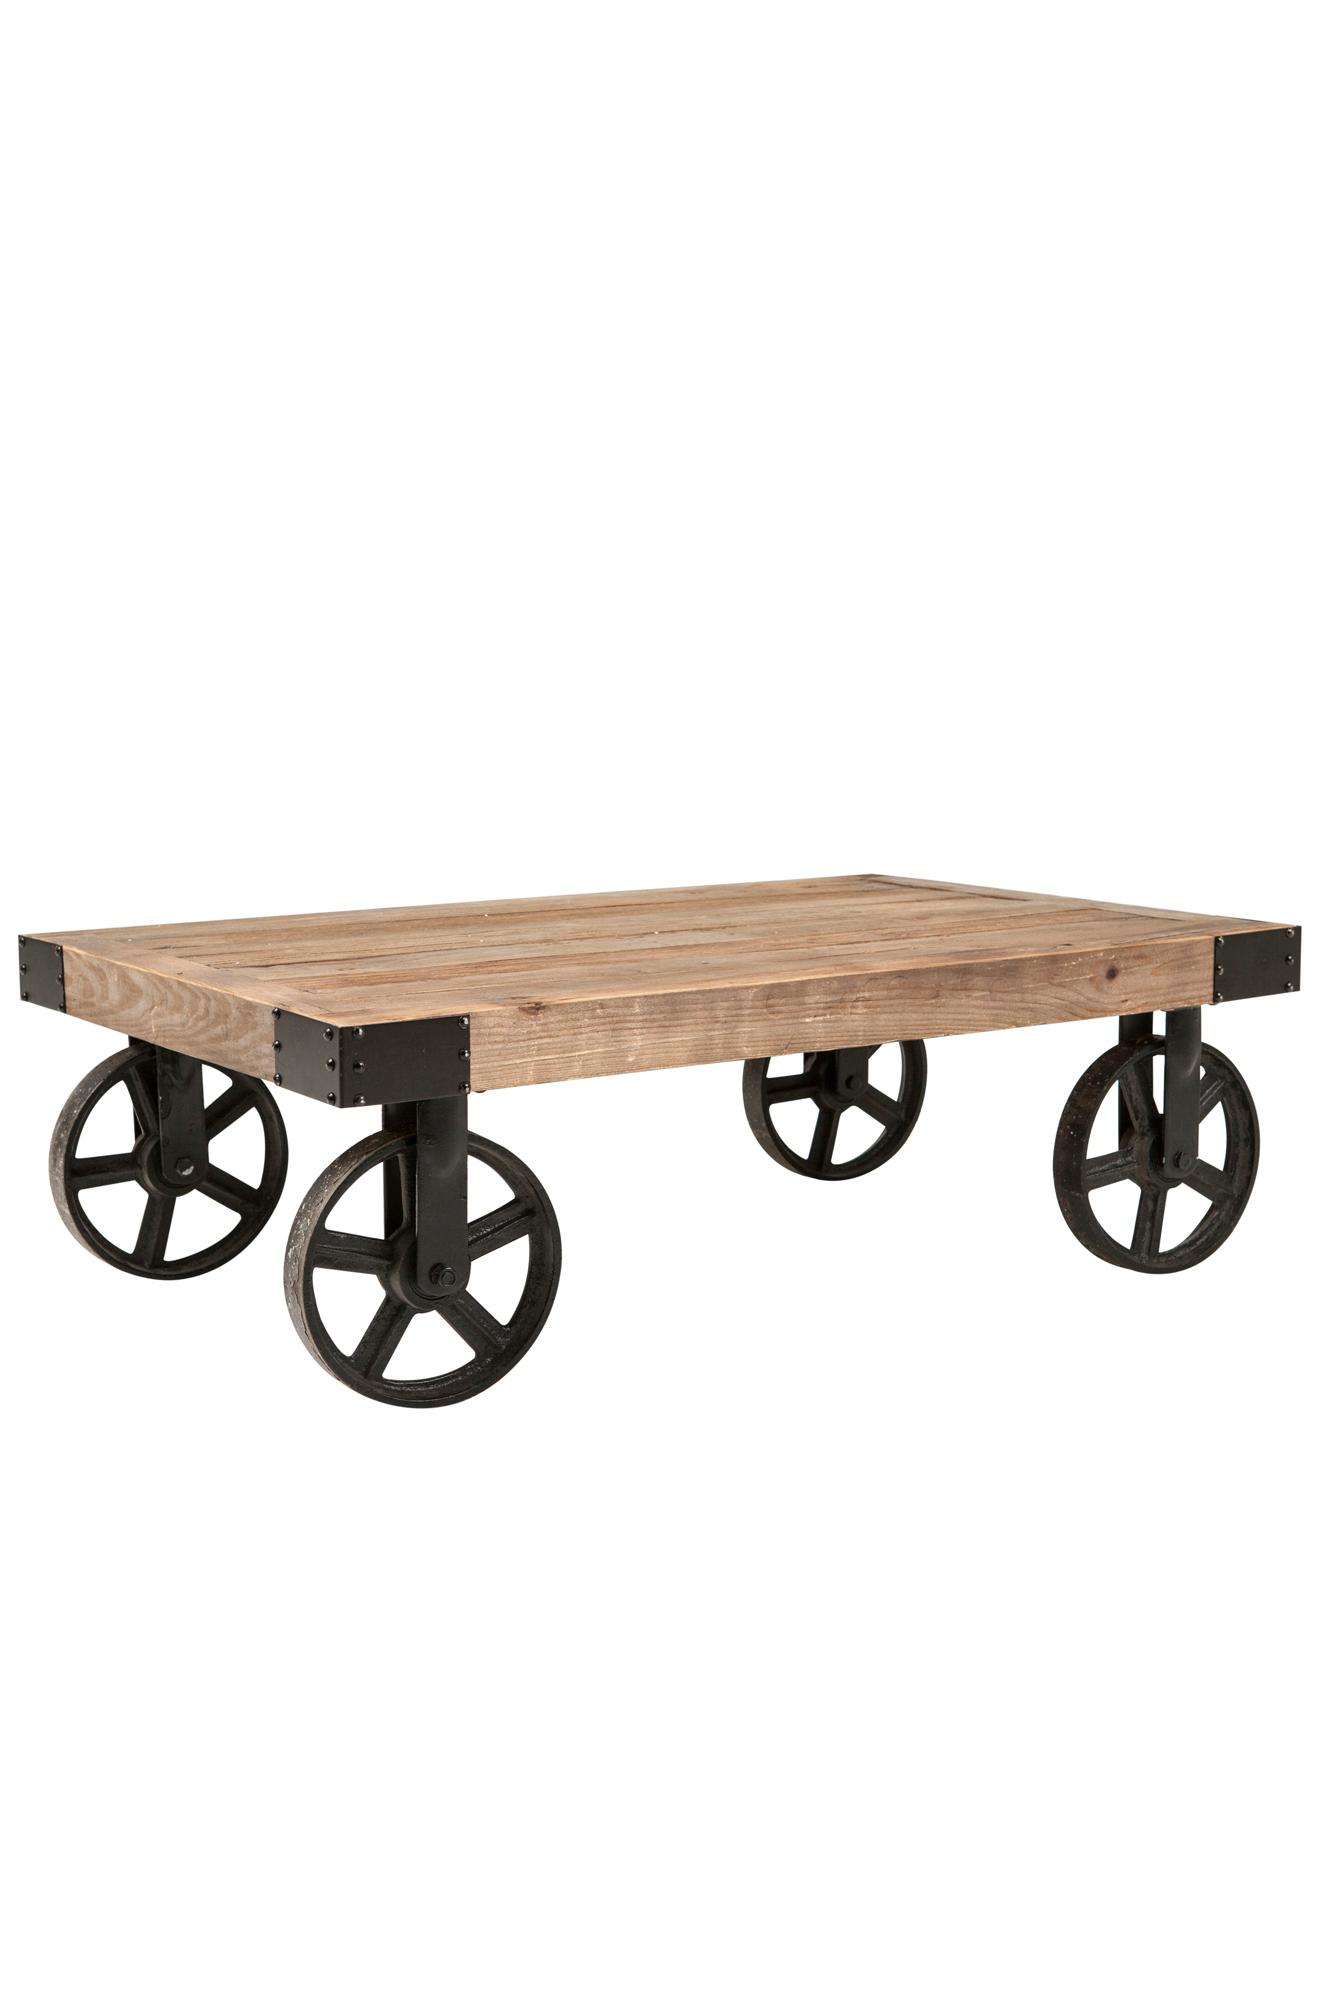 Sohvapöytä 110x72 cm